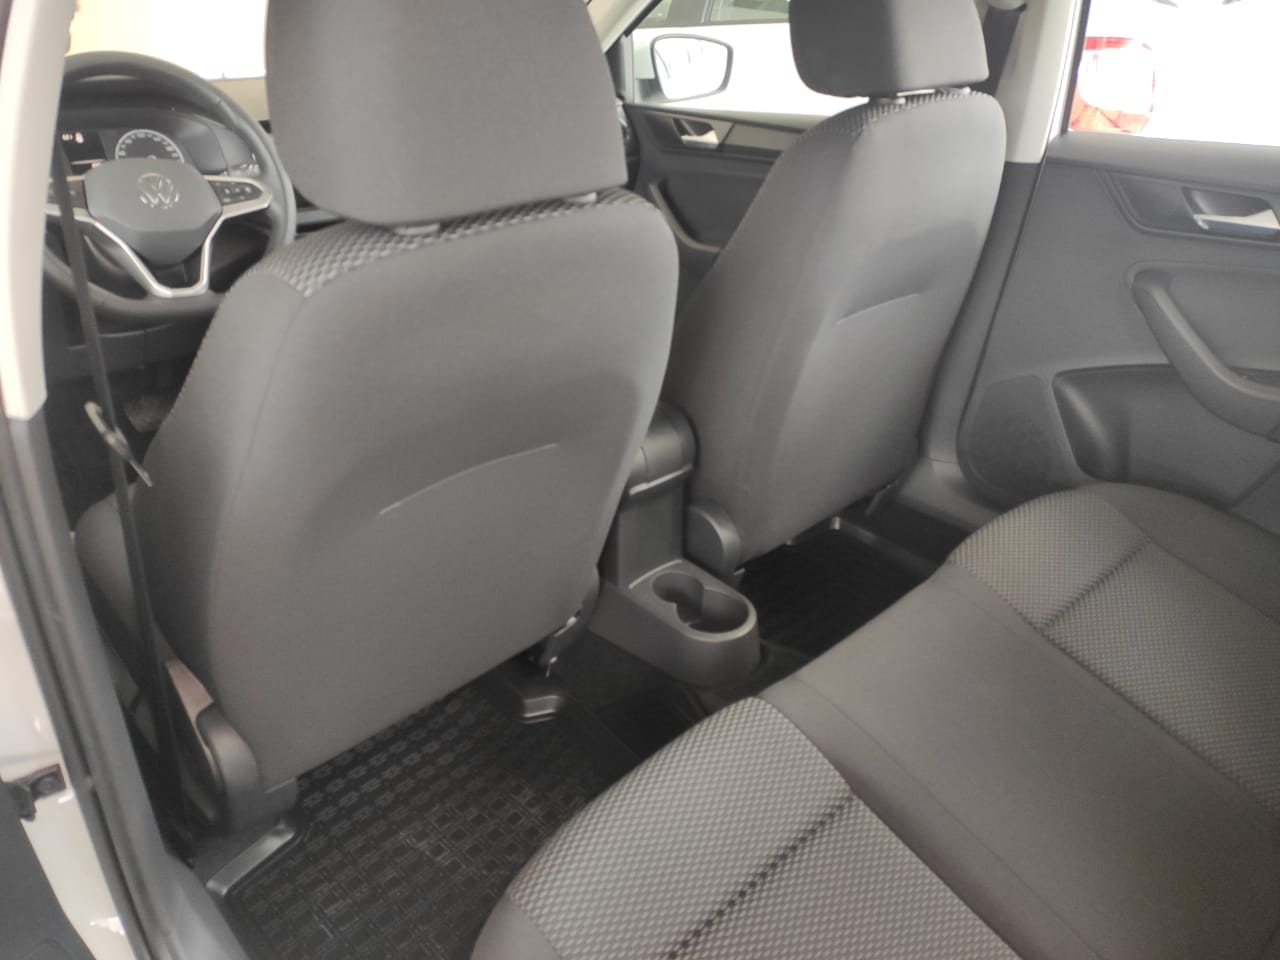 Volkswagen Polo лифтбек, 1.6 л., 16-кл., (110л.с.), 6АТ, Respect, Белый Pure, 2021